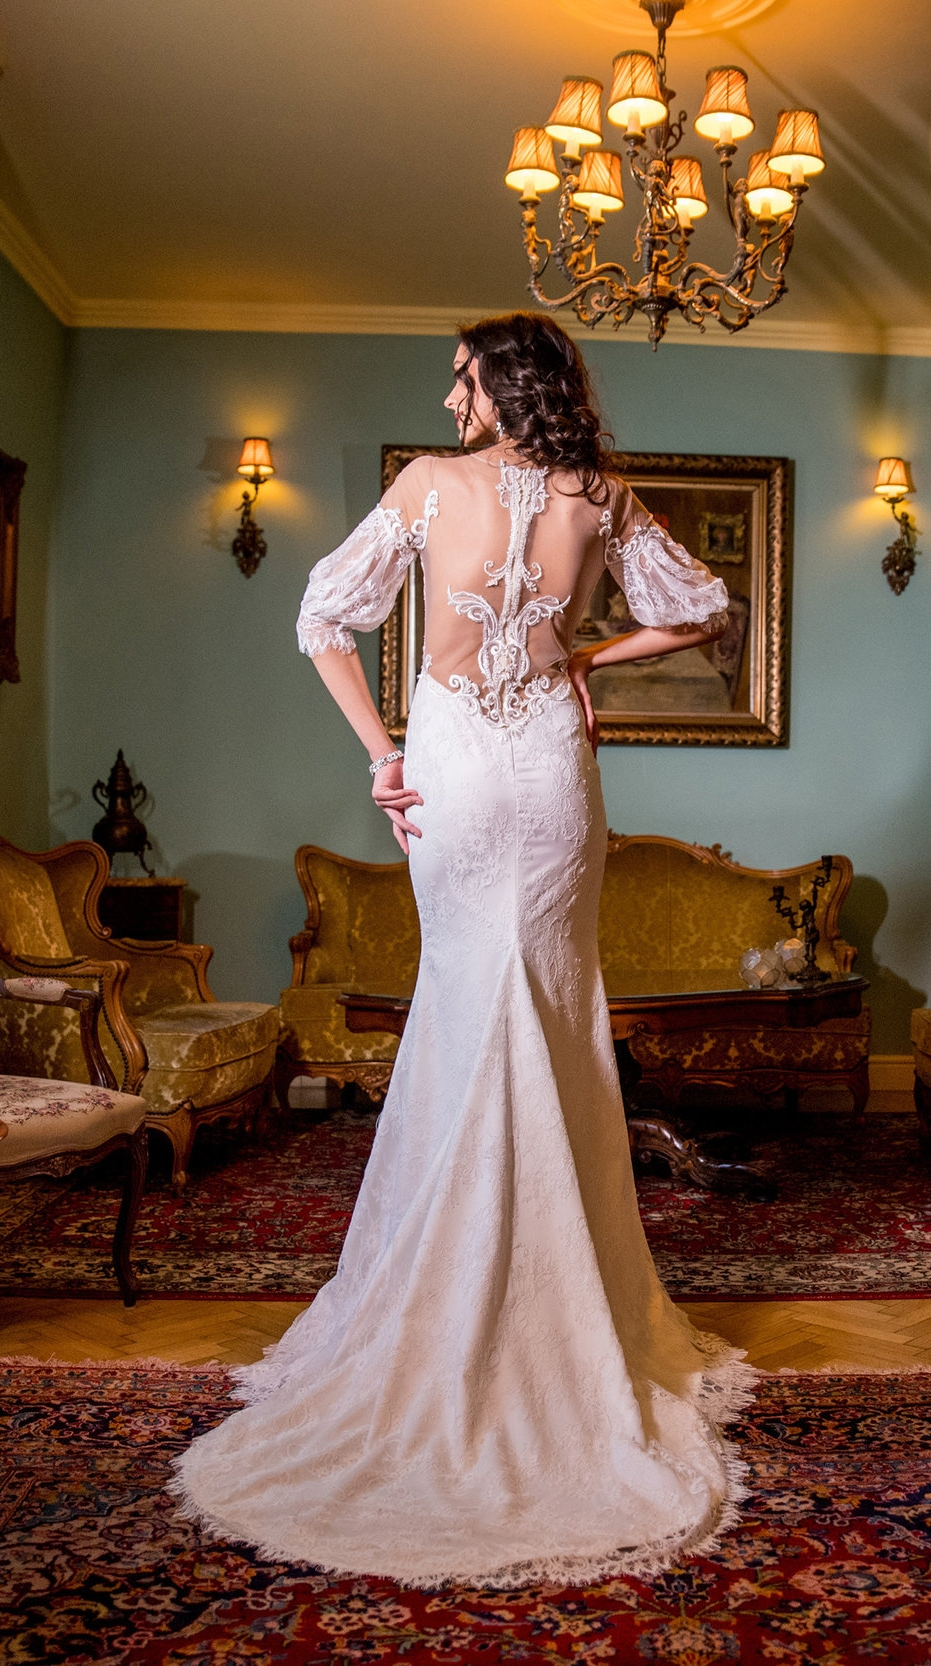 2018 wedding dresses fashion by laina (39).jpg